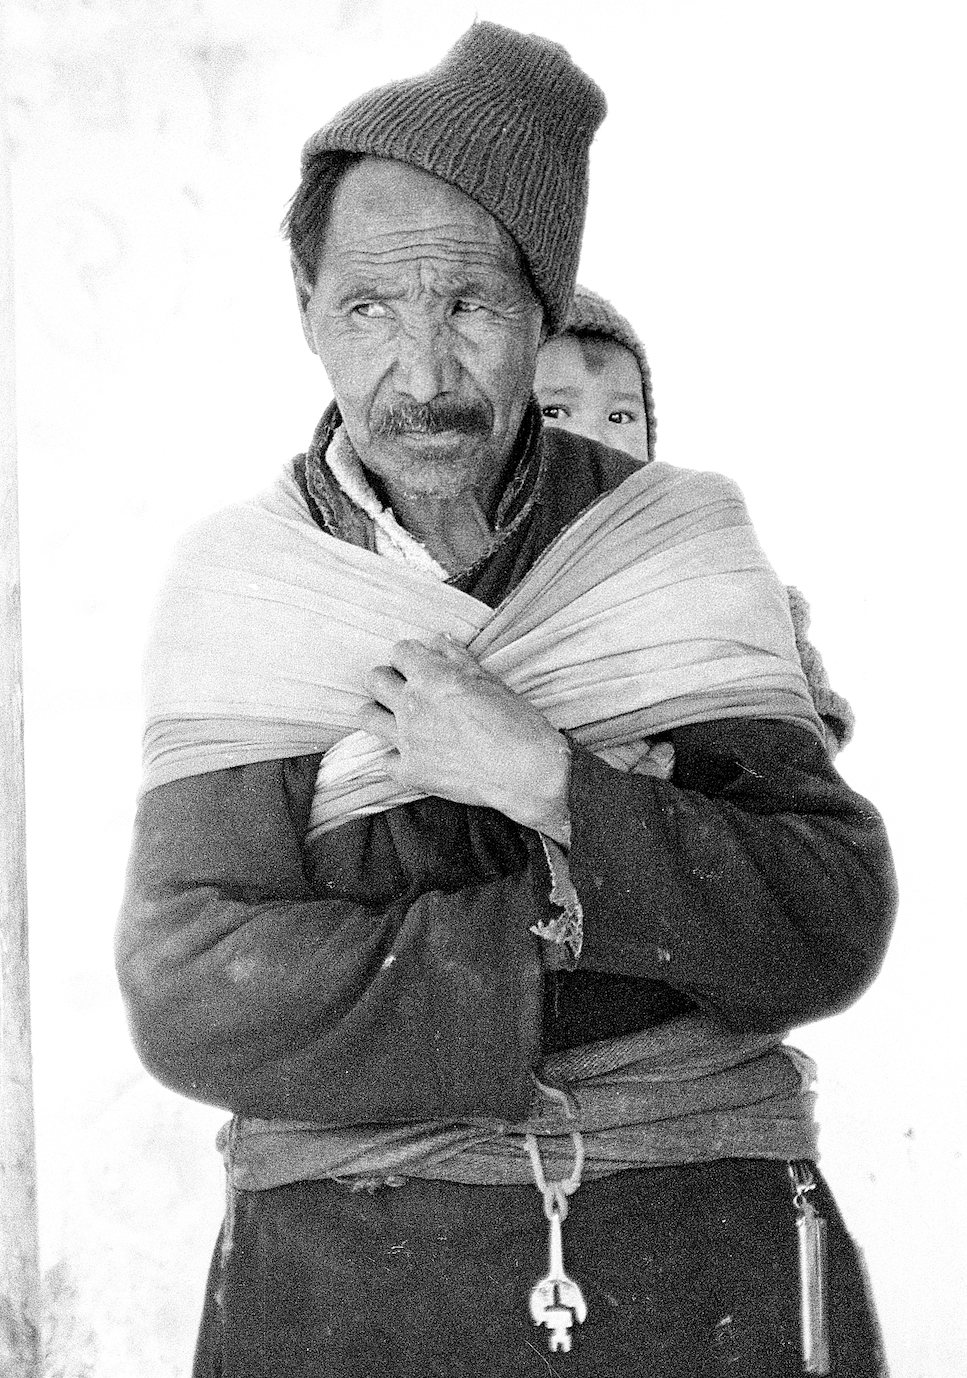 Ladakh, 1986